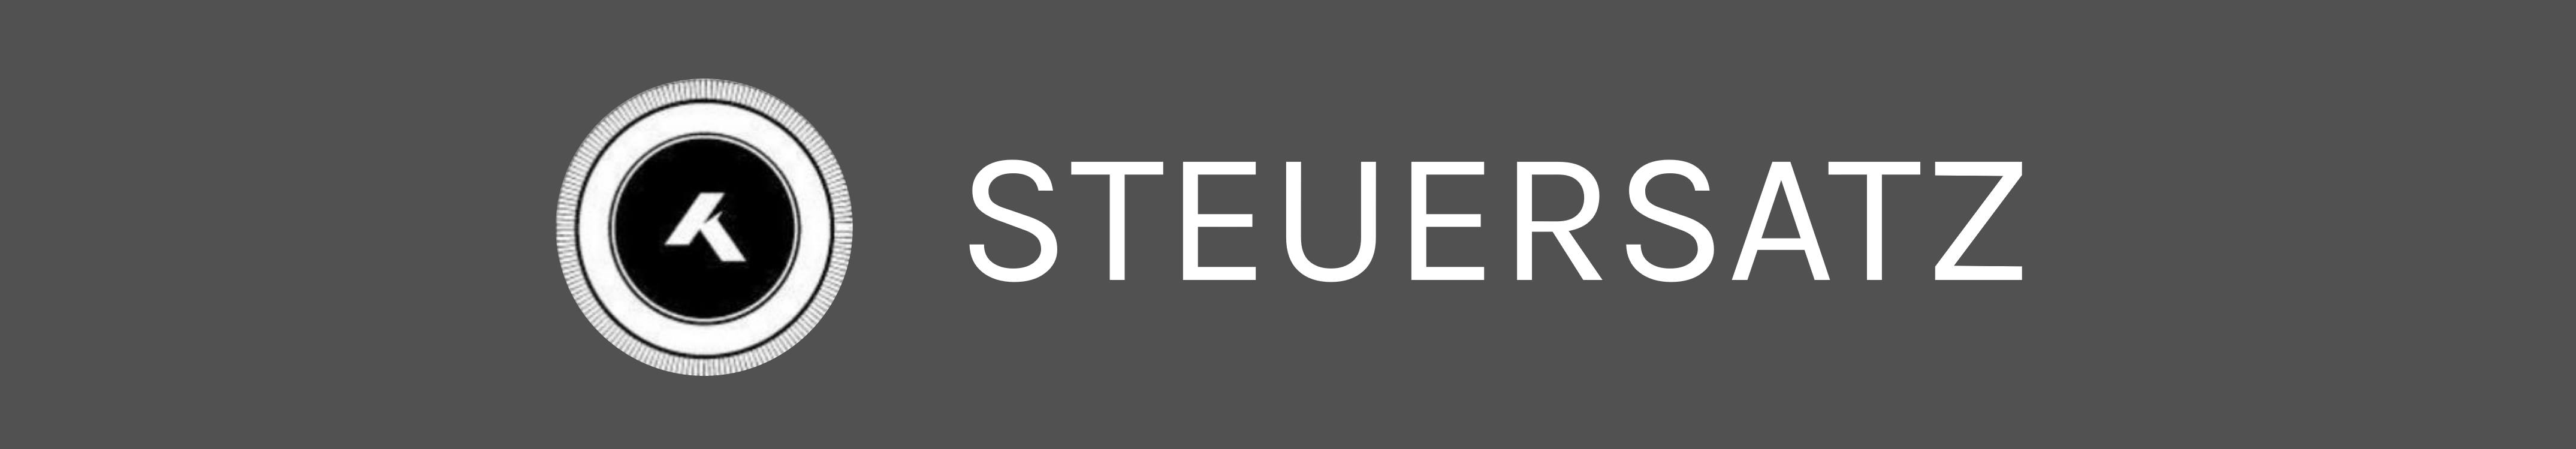 KHE-Banner-steuersatz